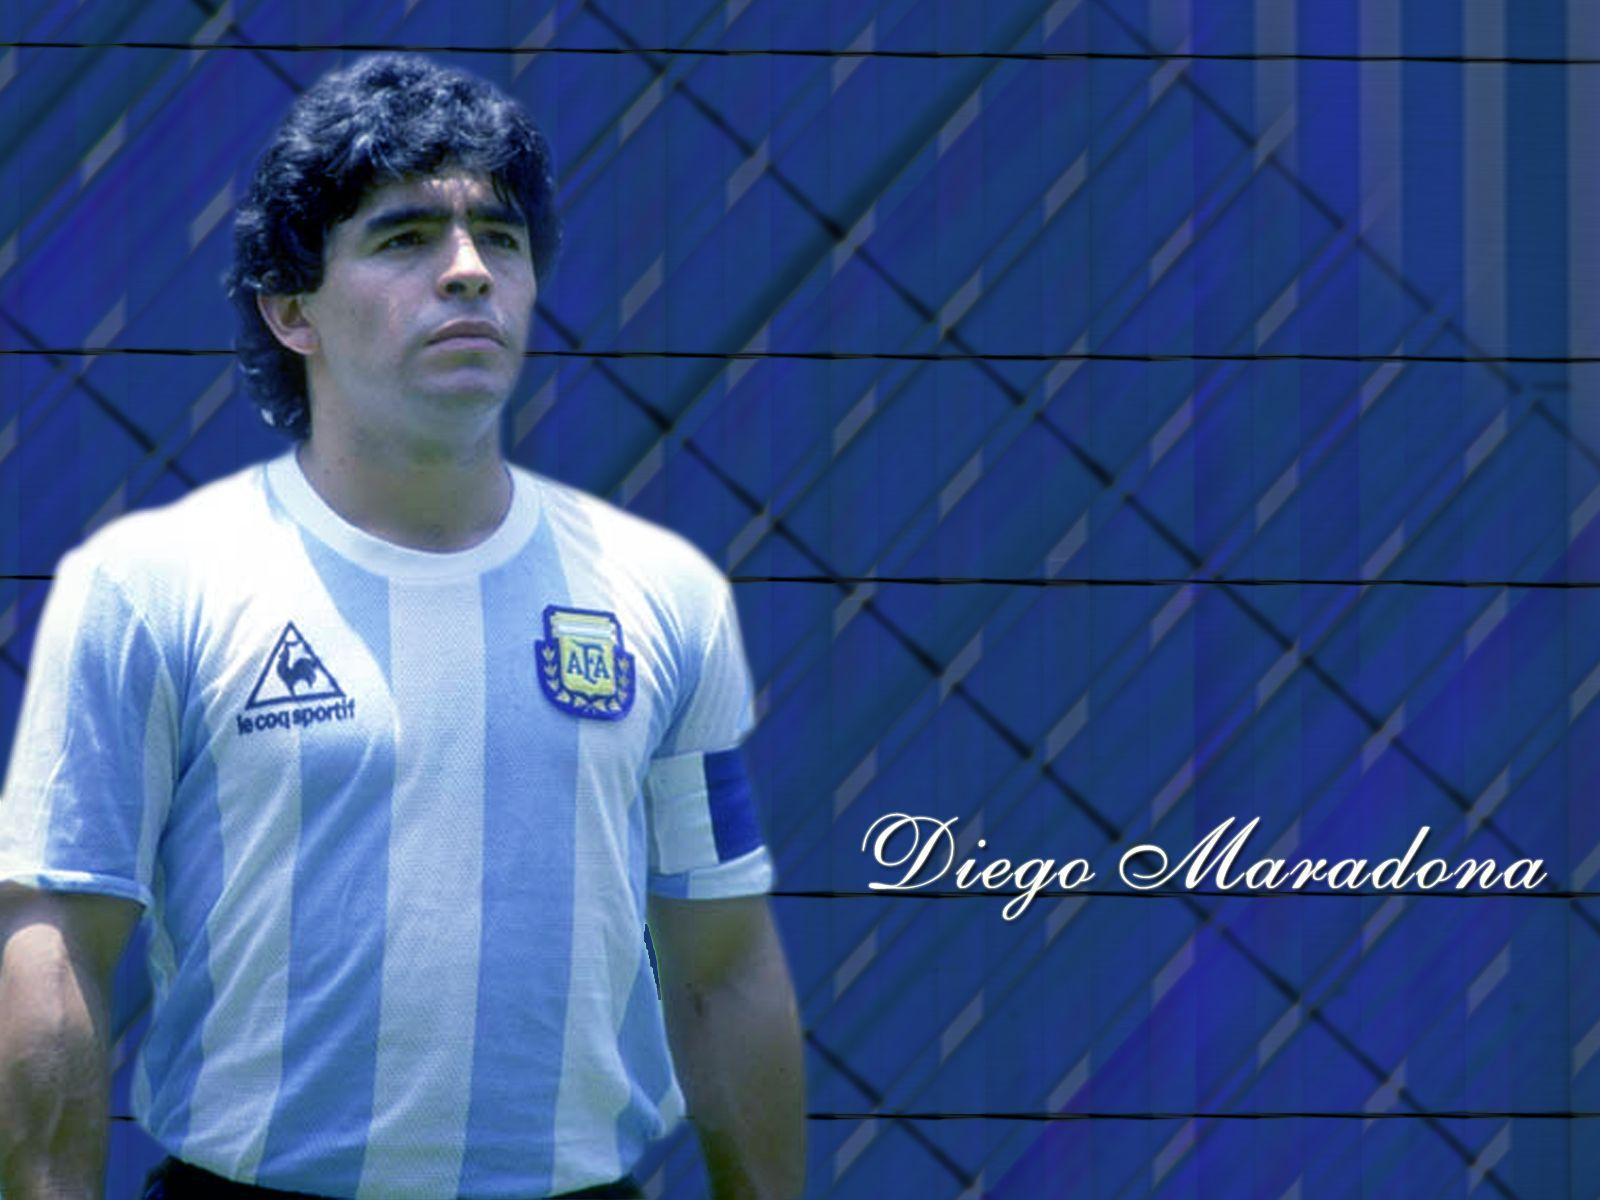 Diego Maradona Wallpapers Wallpaper Cave